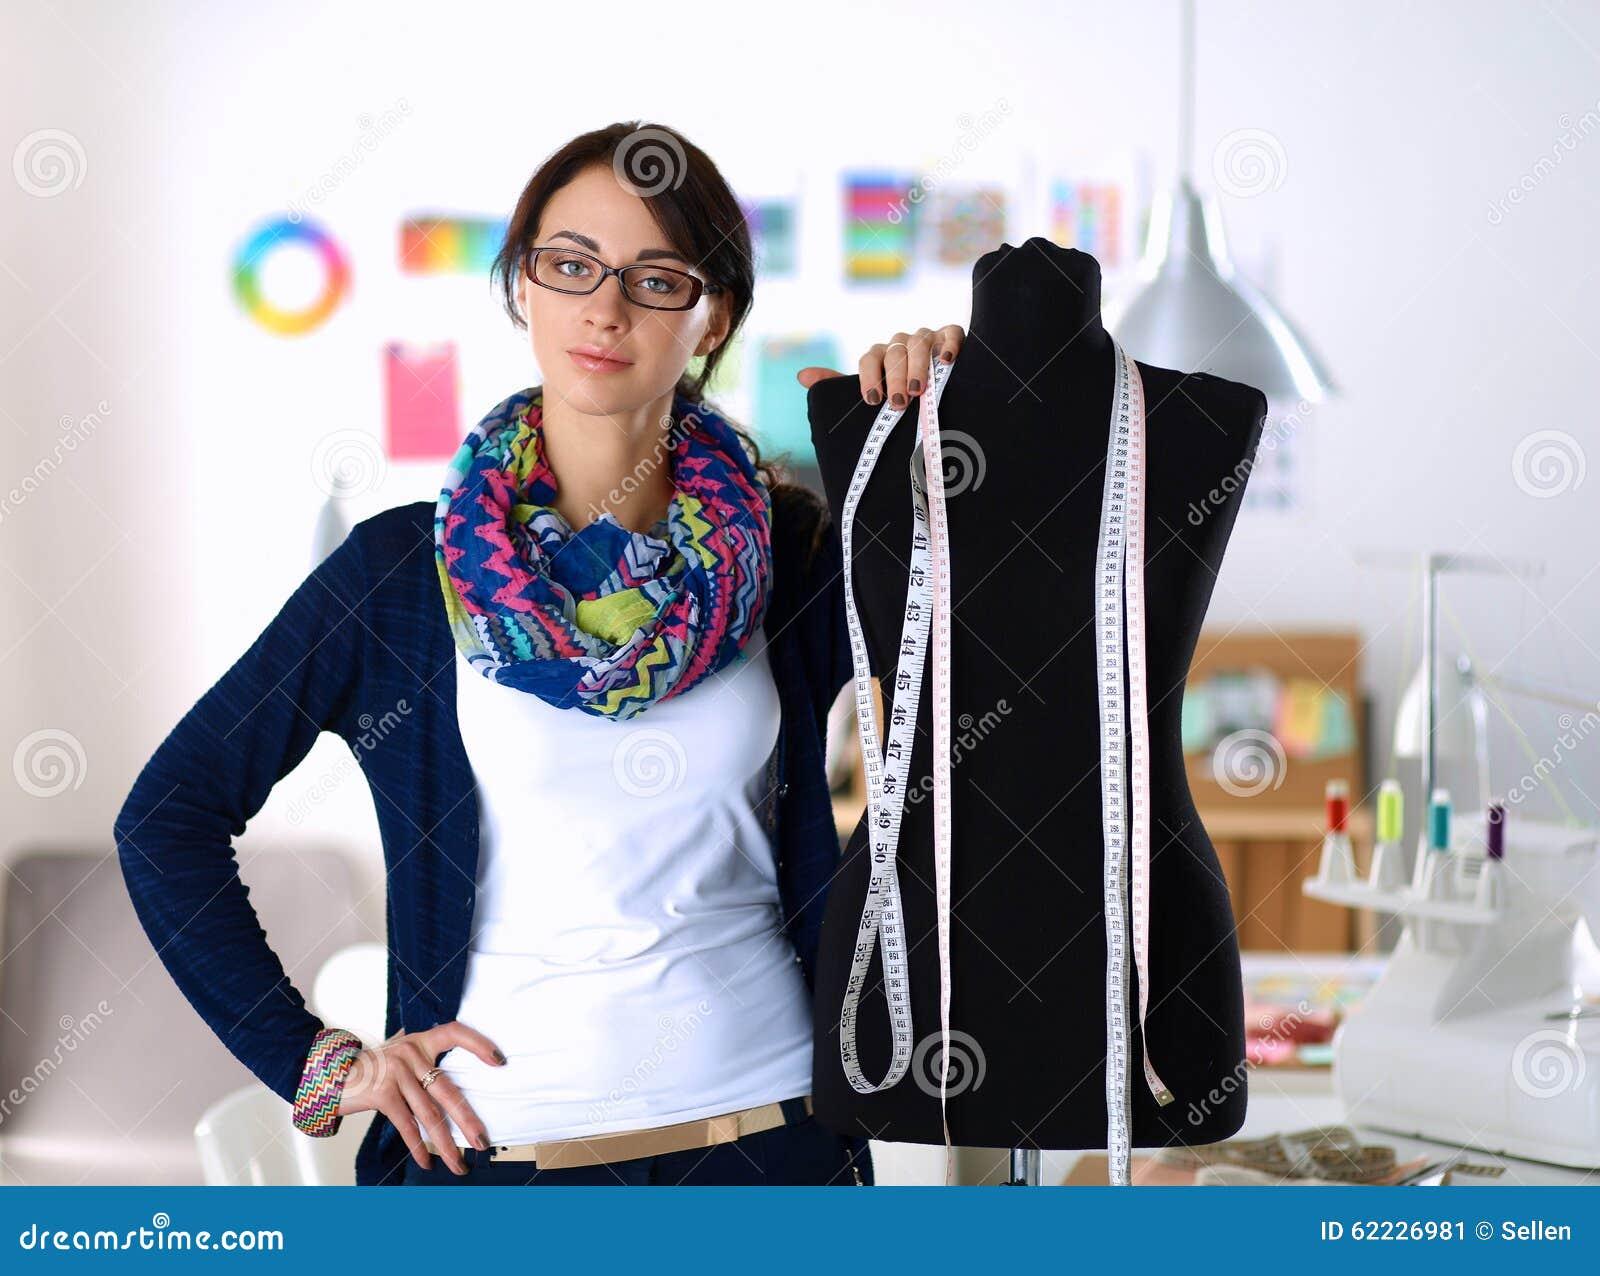 Smiling Fashion Designer Standing Near Mannequin Stock